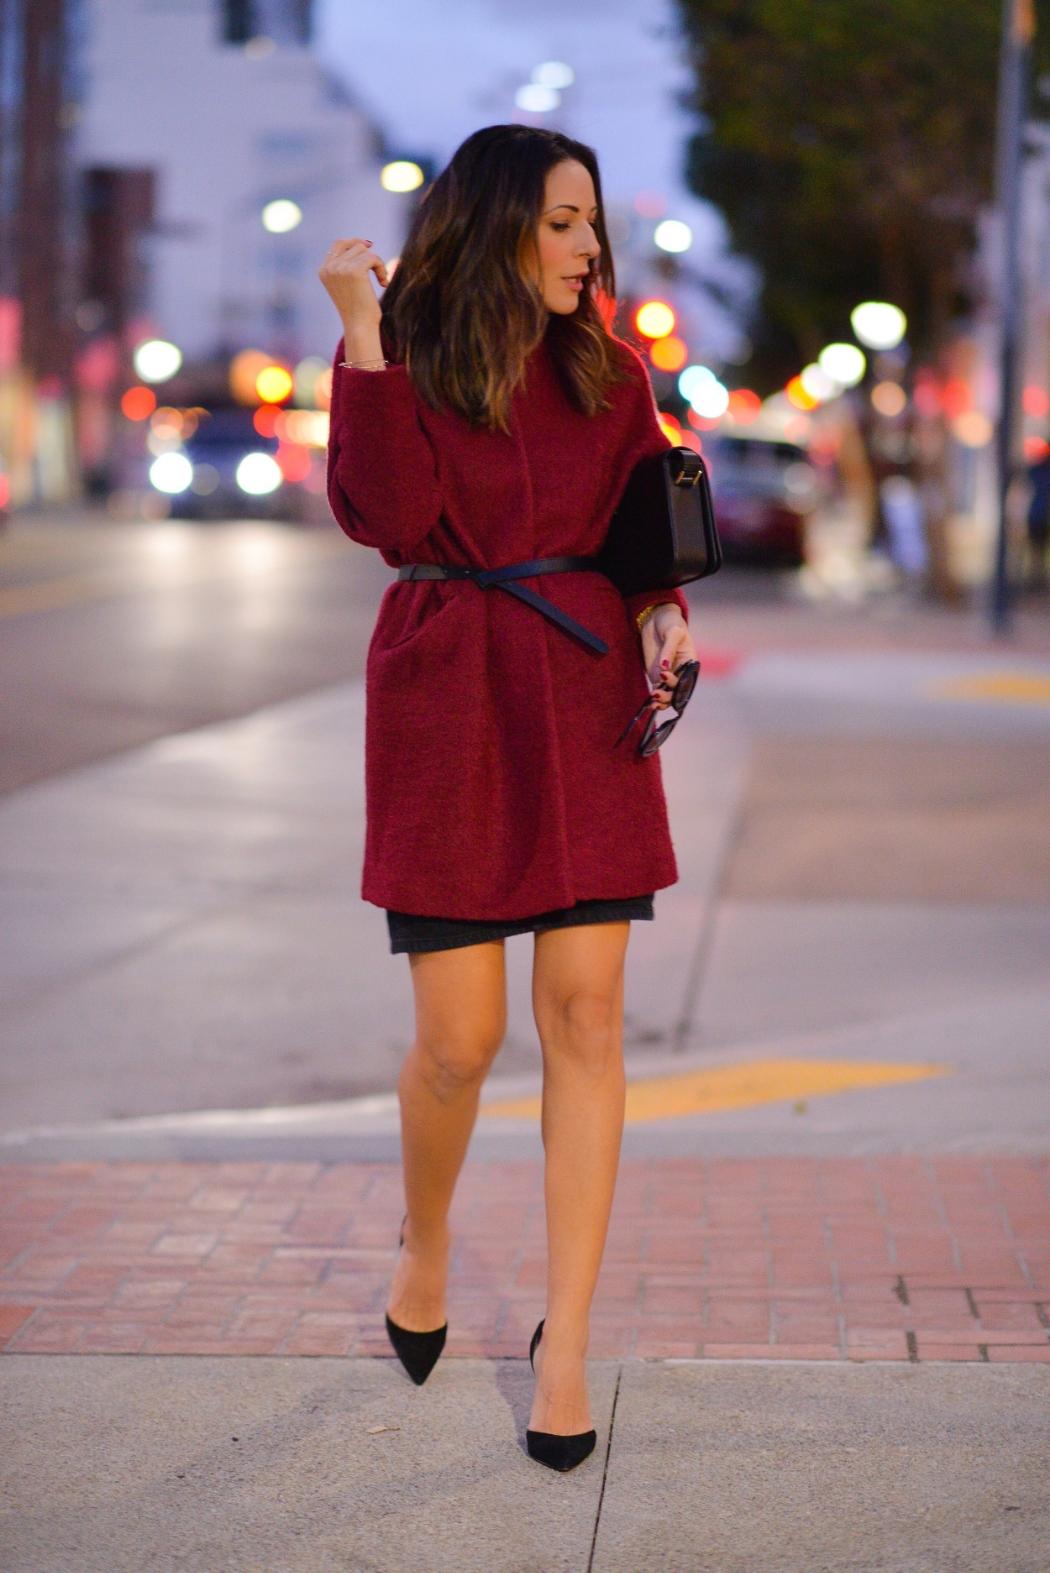 Topshop_Coat_Fashion_SaintLaurent_SanDiego_Streetstyle_LucysWhims_LNA.jpg